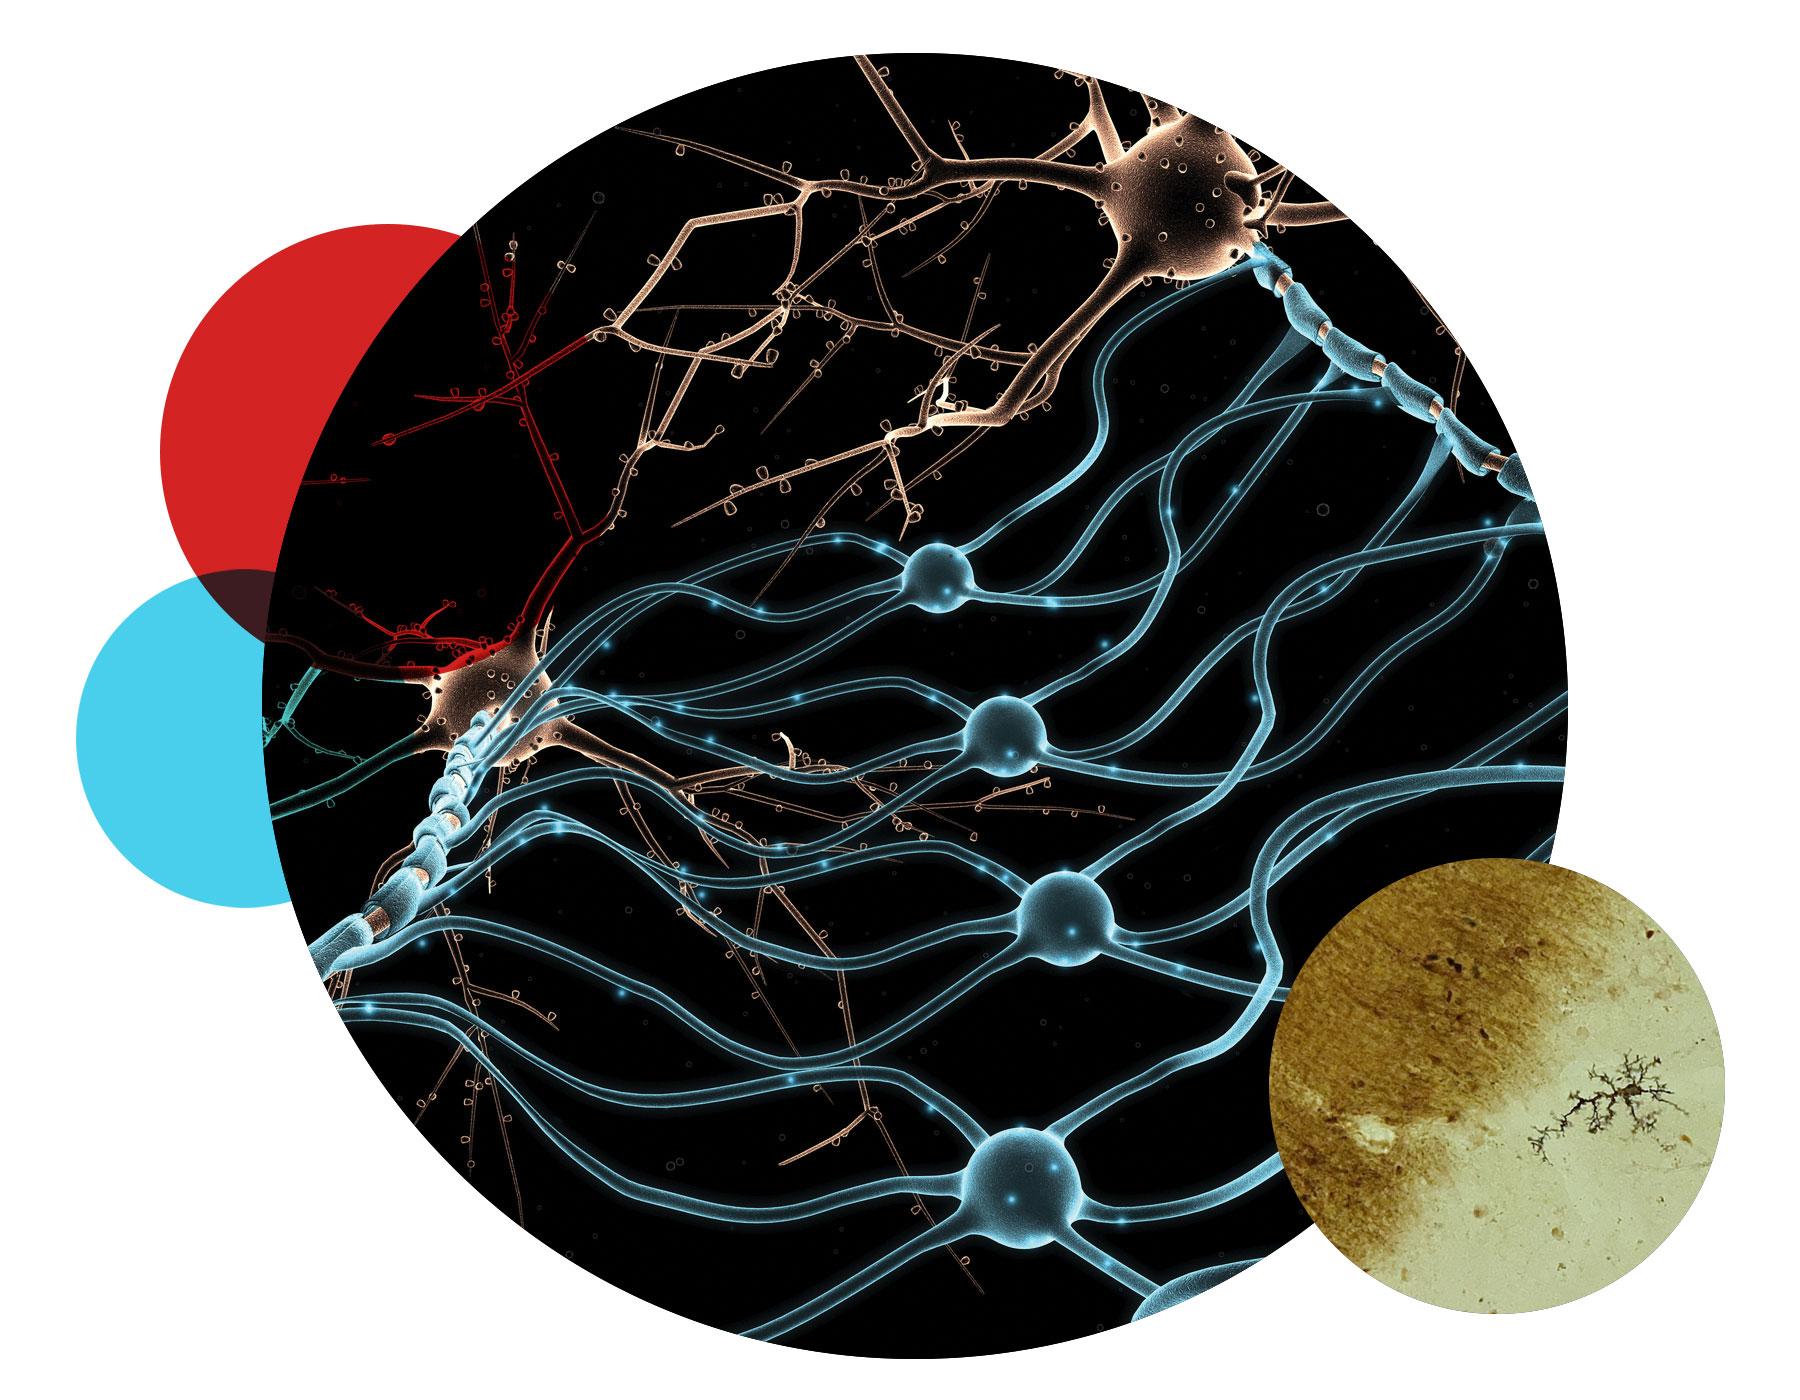 IMAGE: Neurohistology stain for reactive microglia